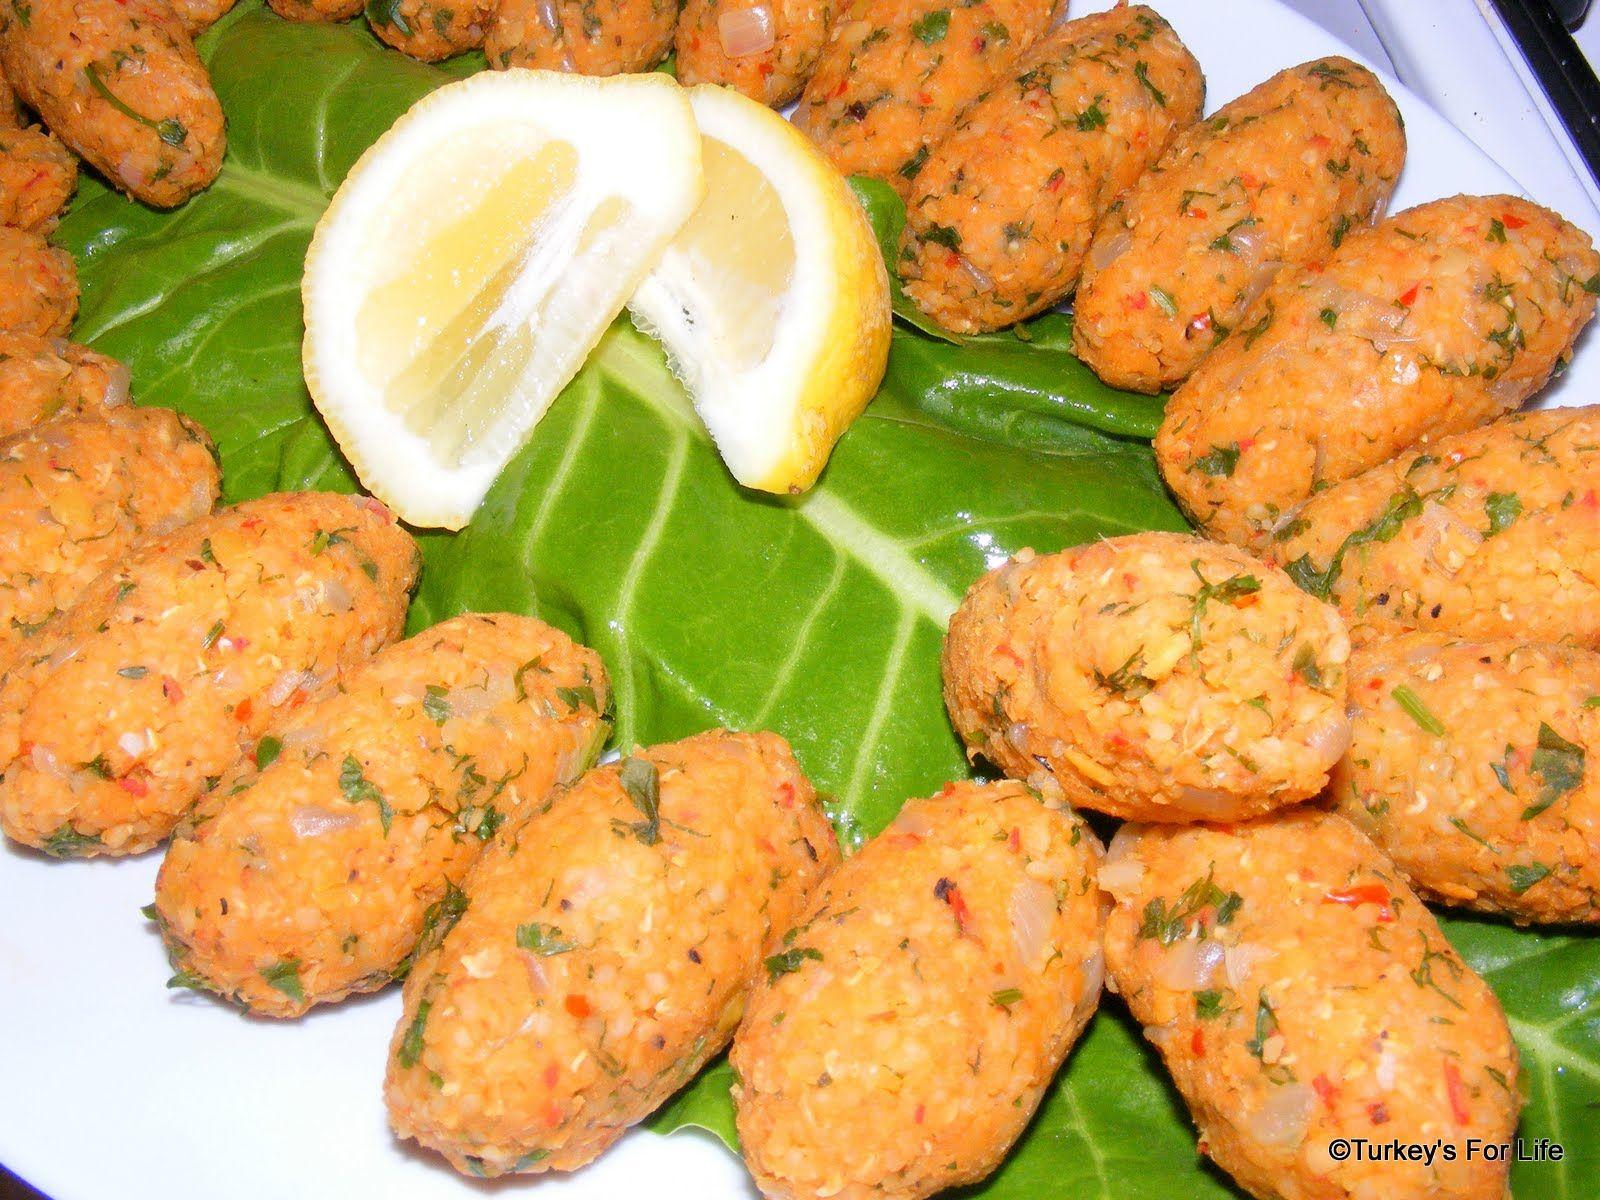 Turkish recipes mercimek kftesi summer dishes lentils and food forumfinder Choice Image